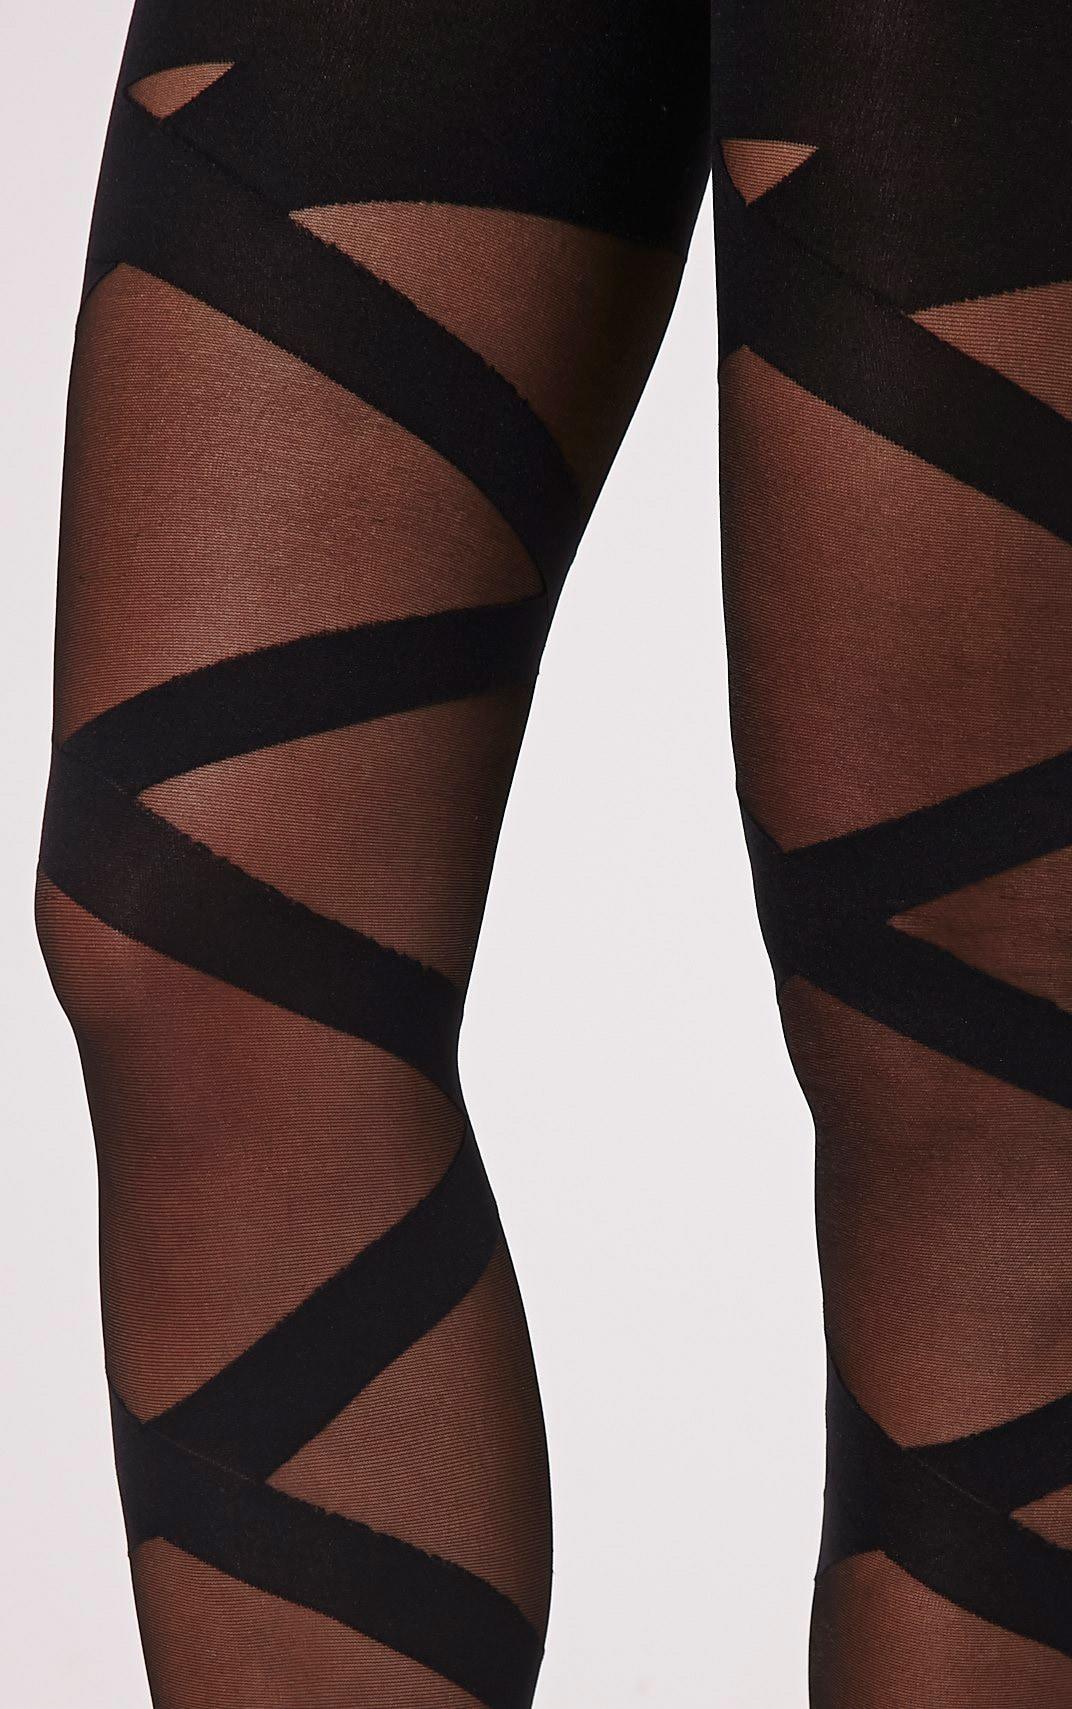 Dari Black Bandage Style Tights 3